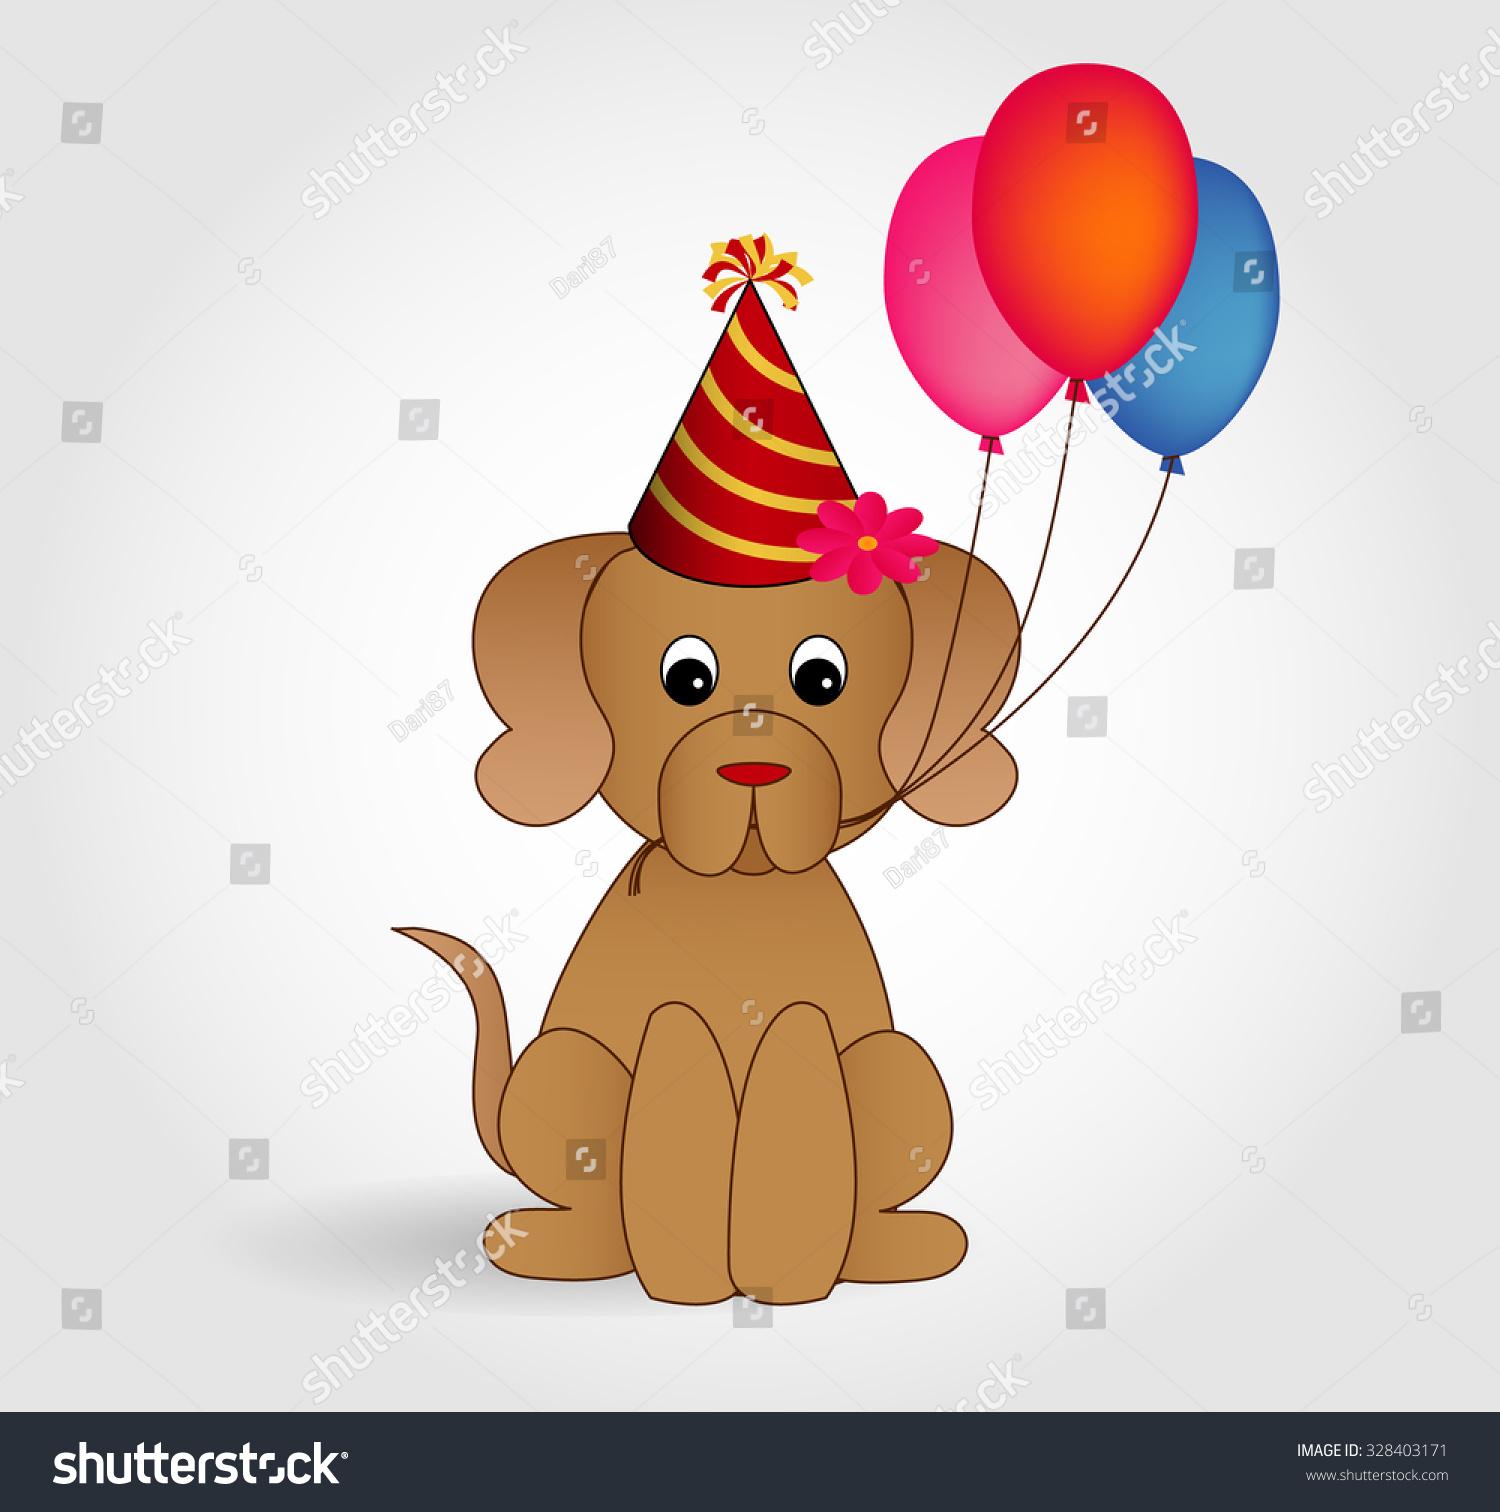 Cartoon Dog Character Wishing Happy Birthday Stock Vector Royalty Free 328403171